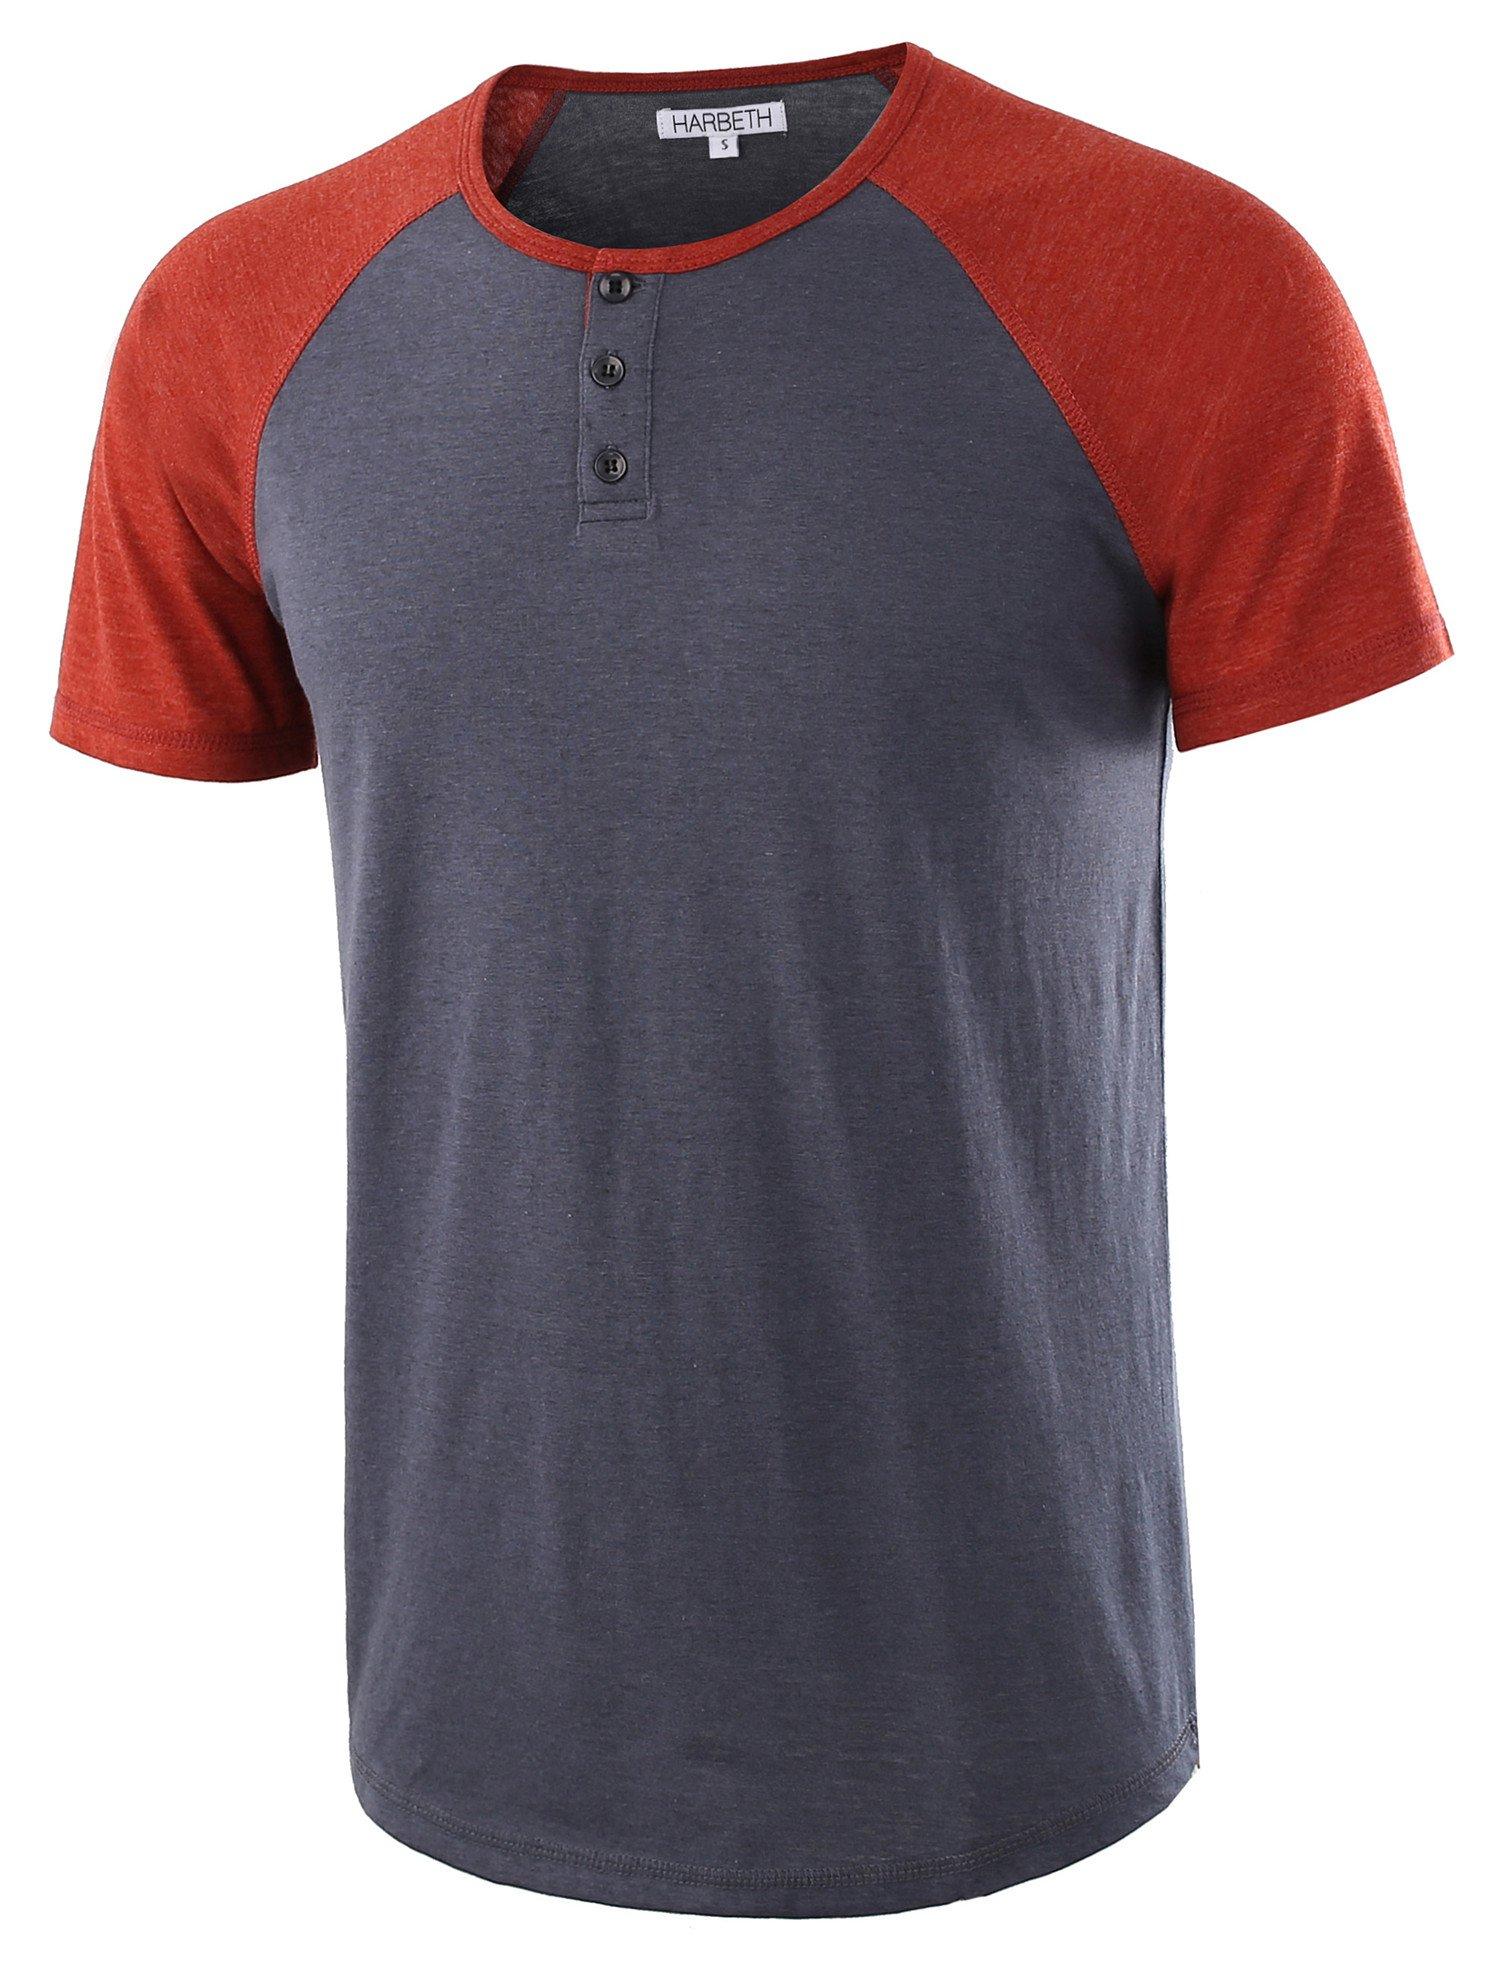 HARBETH Men's Casual Short Sleeve Henley Shirt Raglan Fit Baseball T-Shirts Tee Cadet Blue/Rusty L by HARBETH